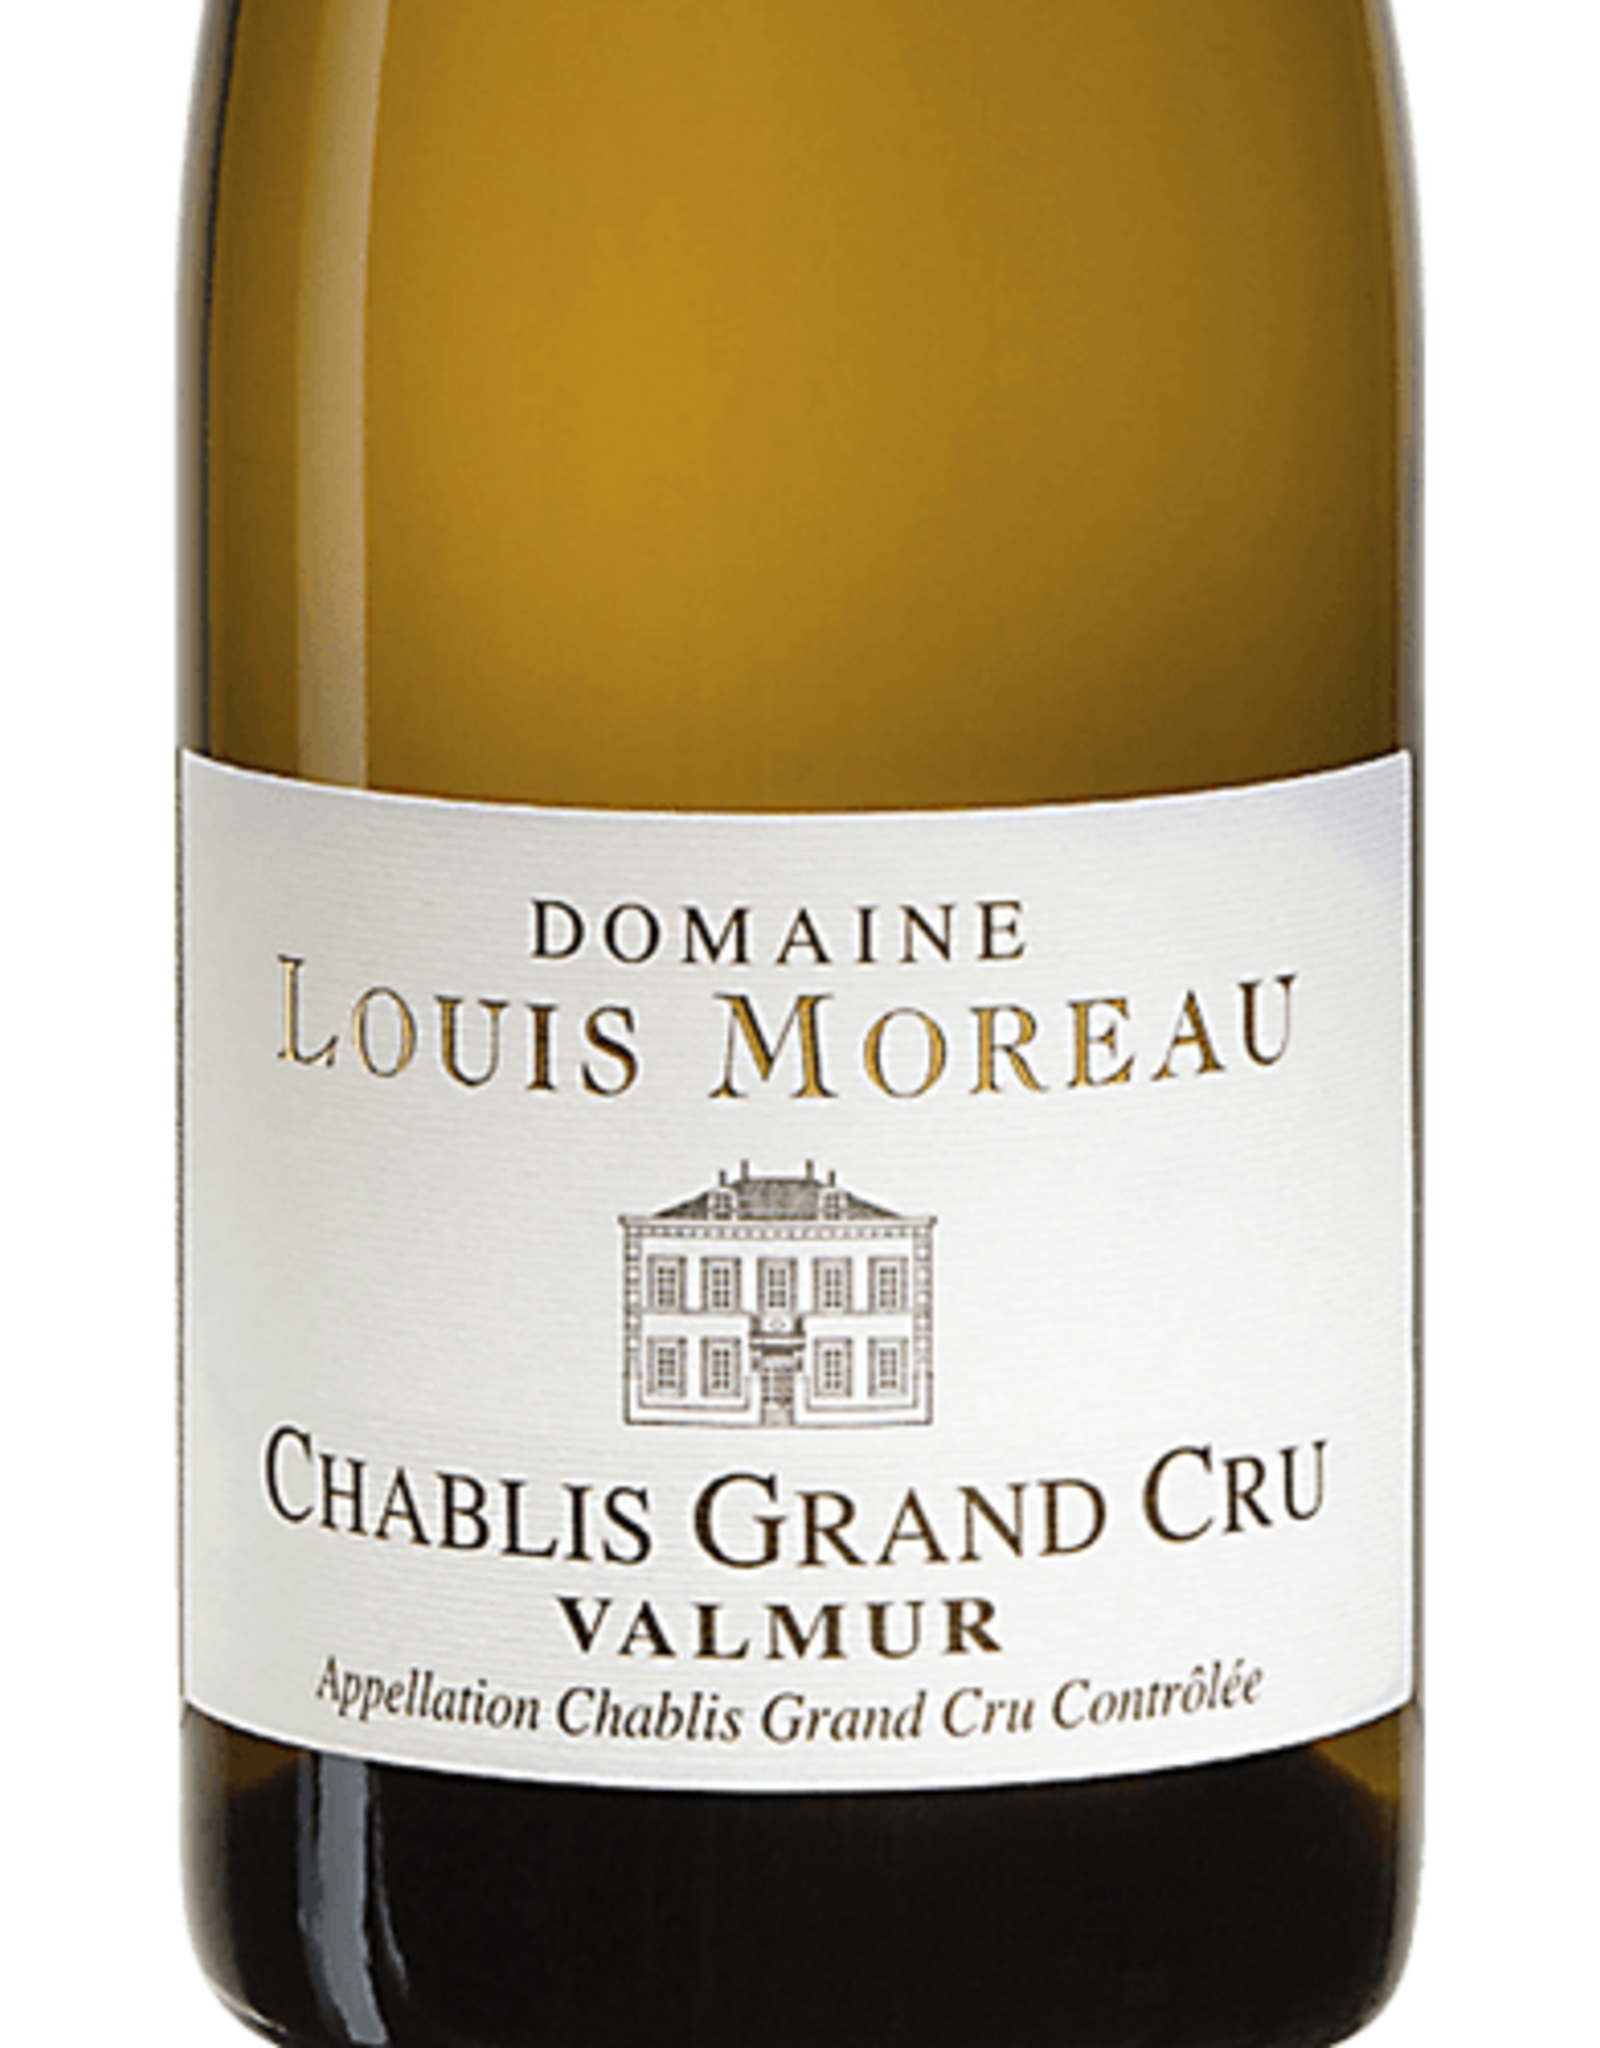 Domaine Louie Moreau Chablis Grand Cru Valmur, Burgundy 2016